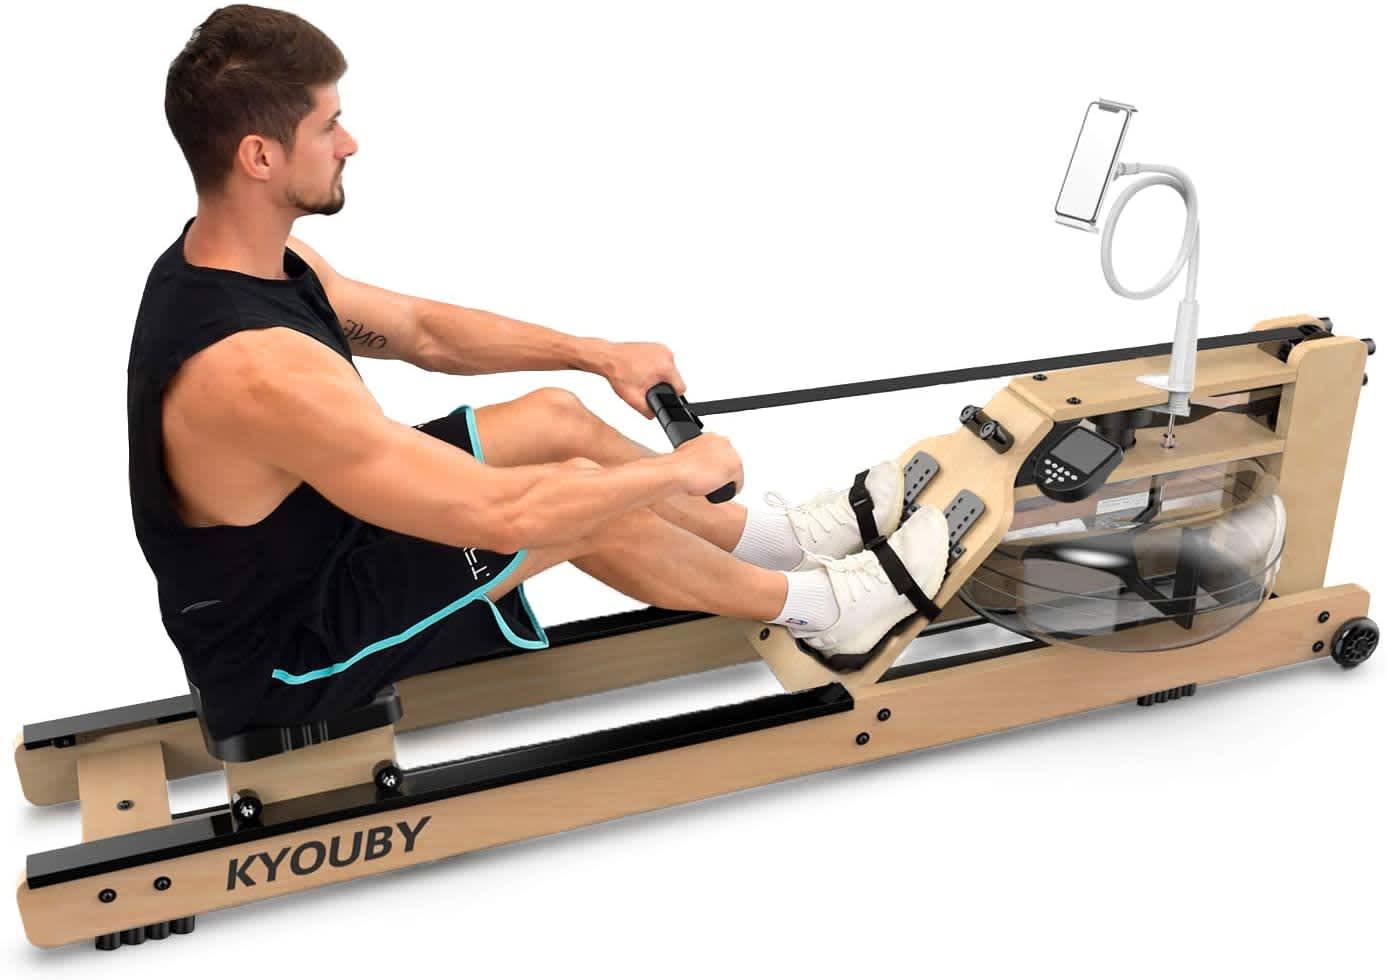 Kyouby Water-Resistance Rower